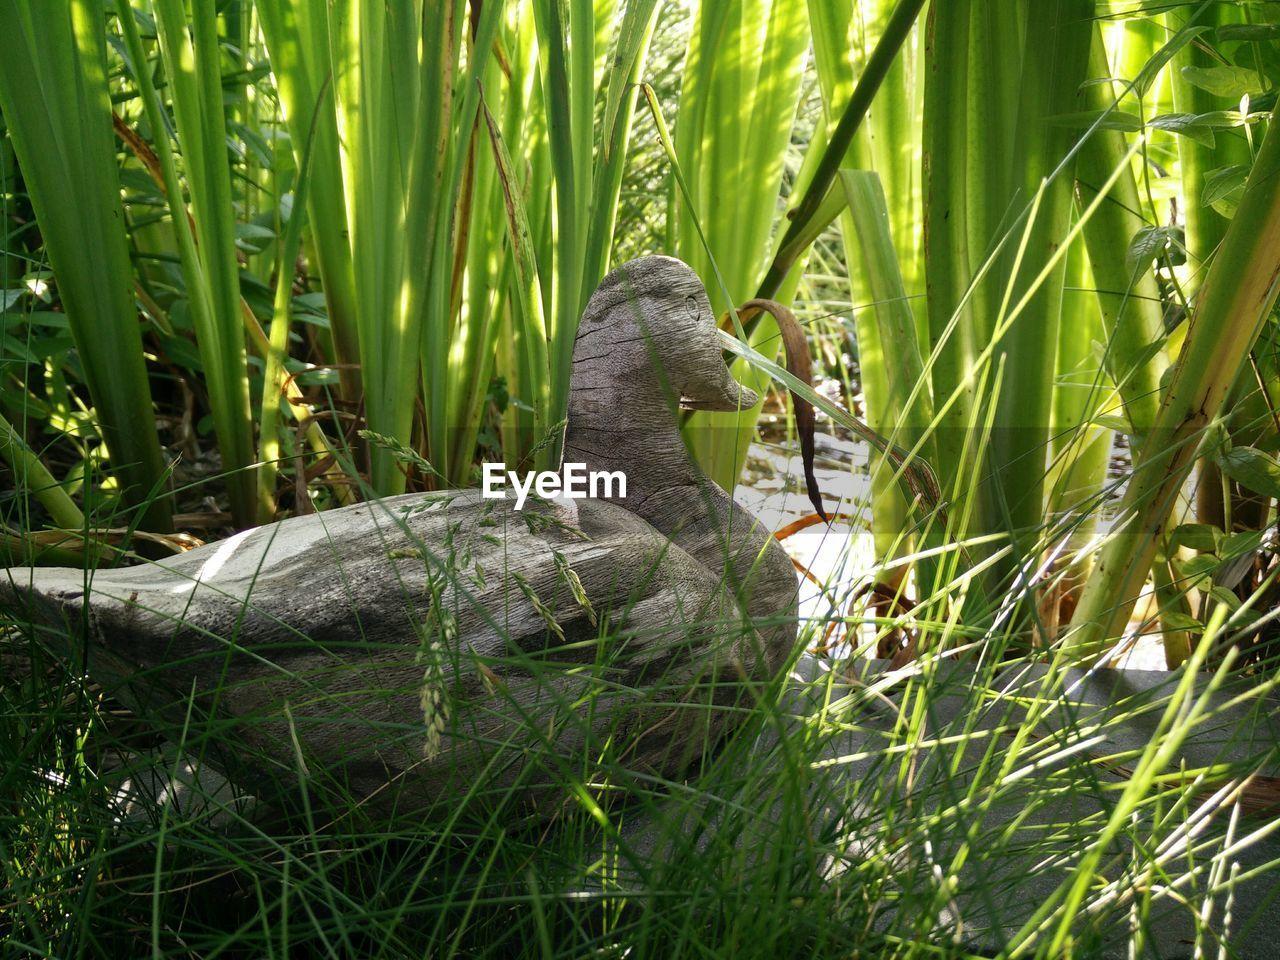 Wooden duck amidst plants